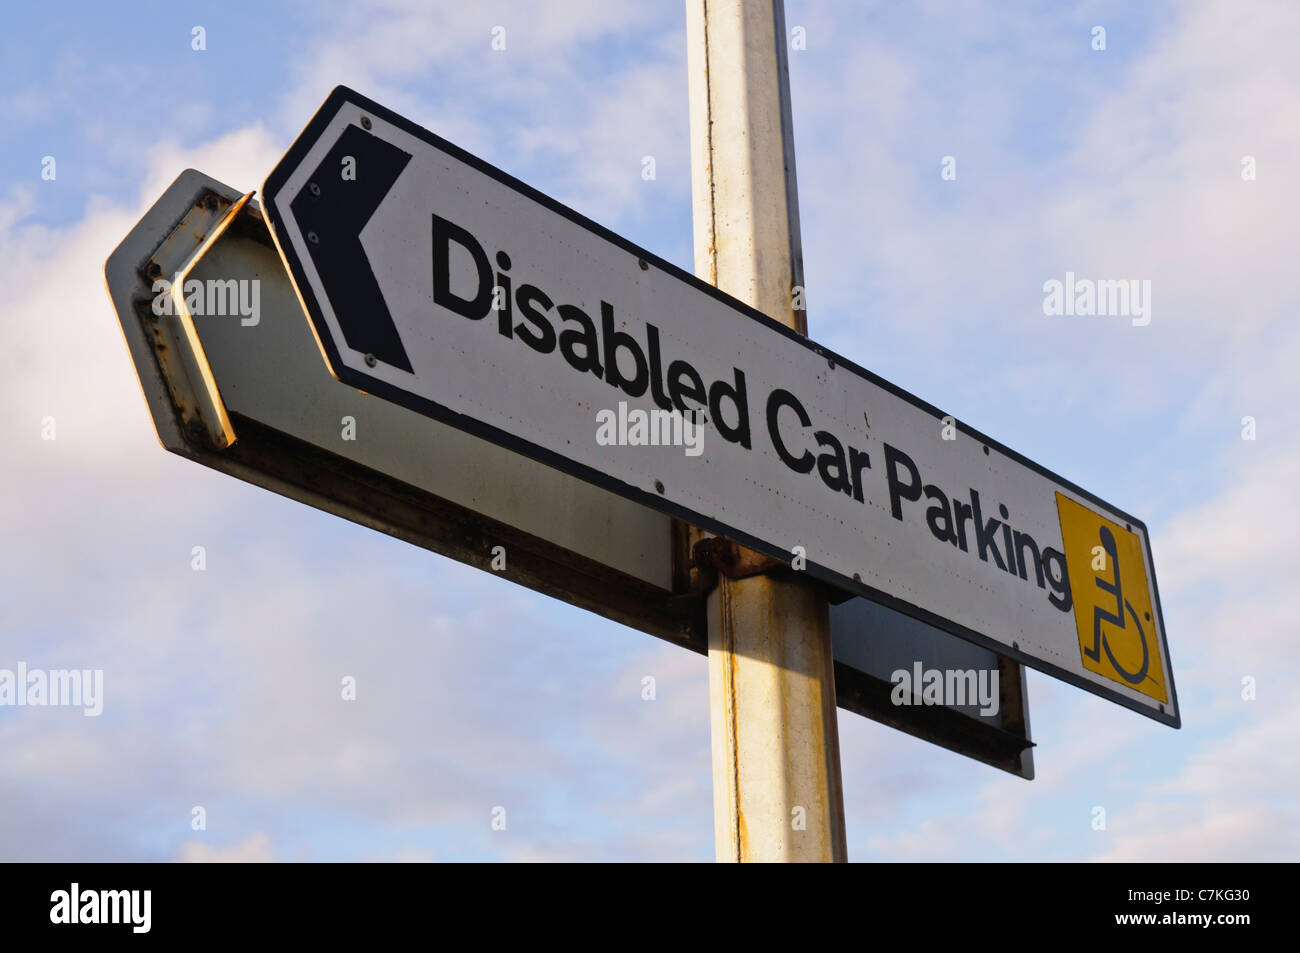 Disabled Car Parking sign - Stock Image